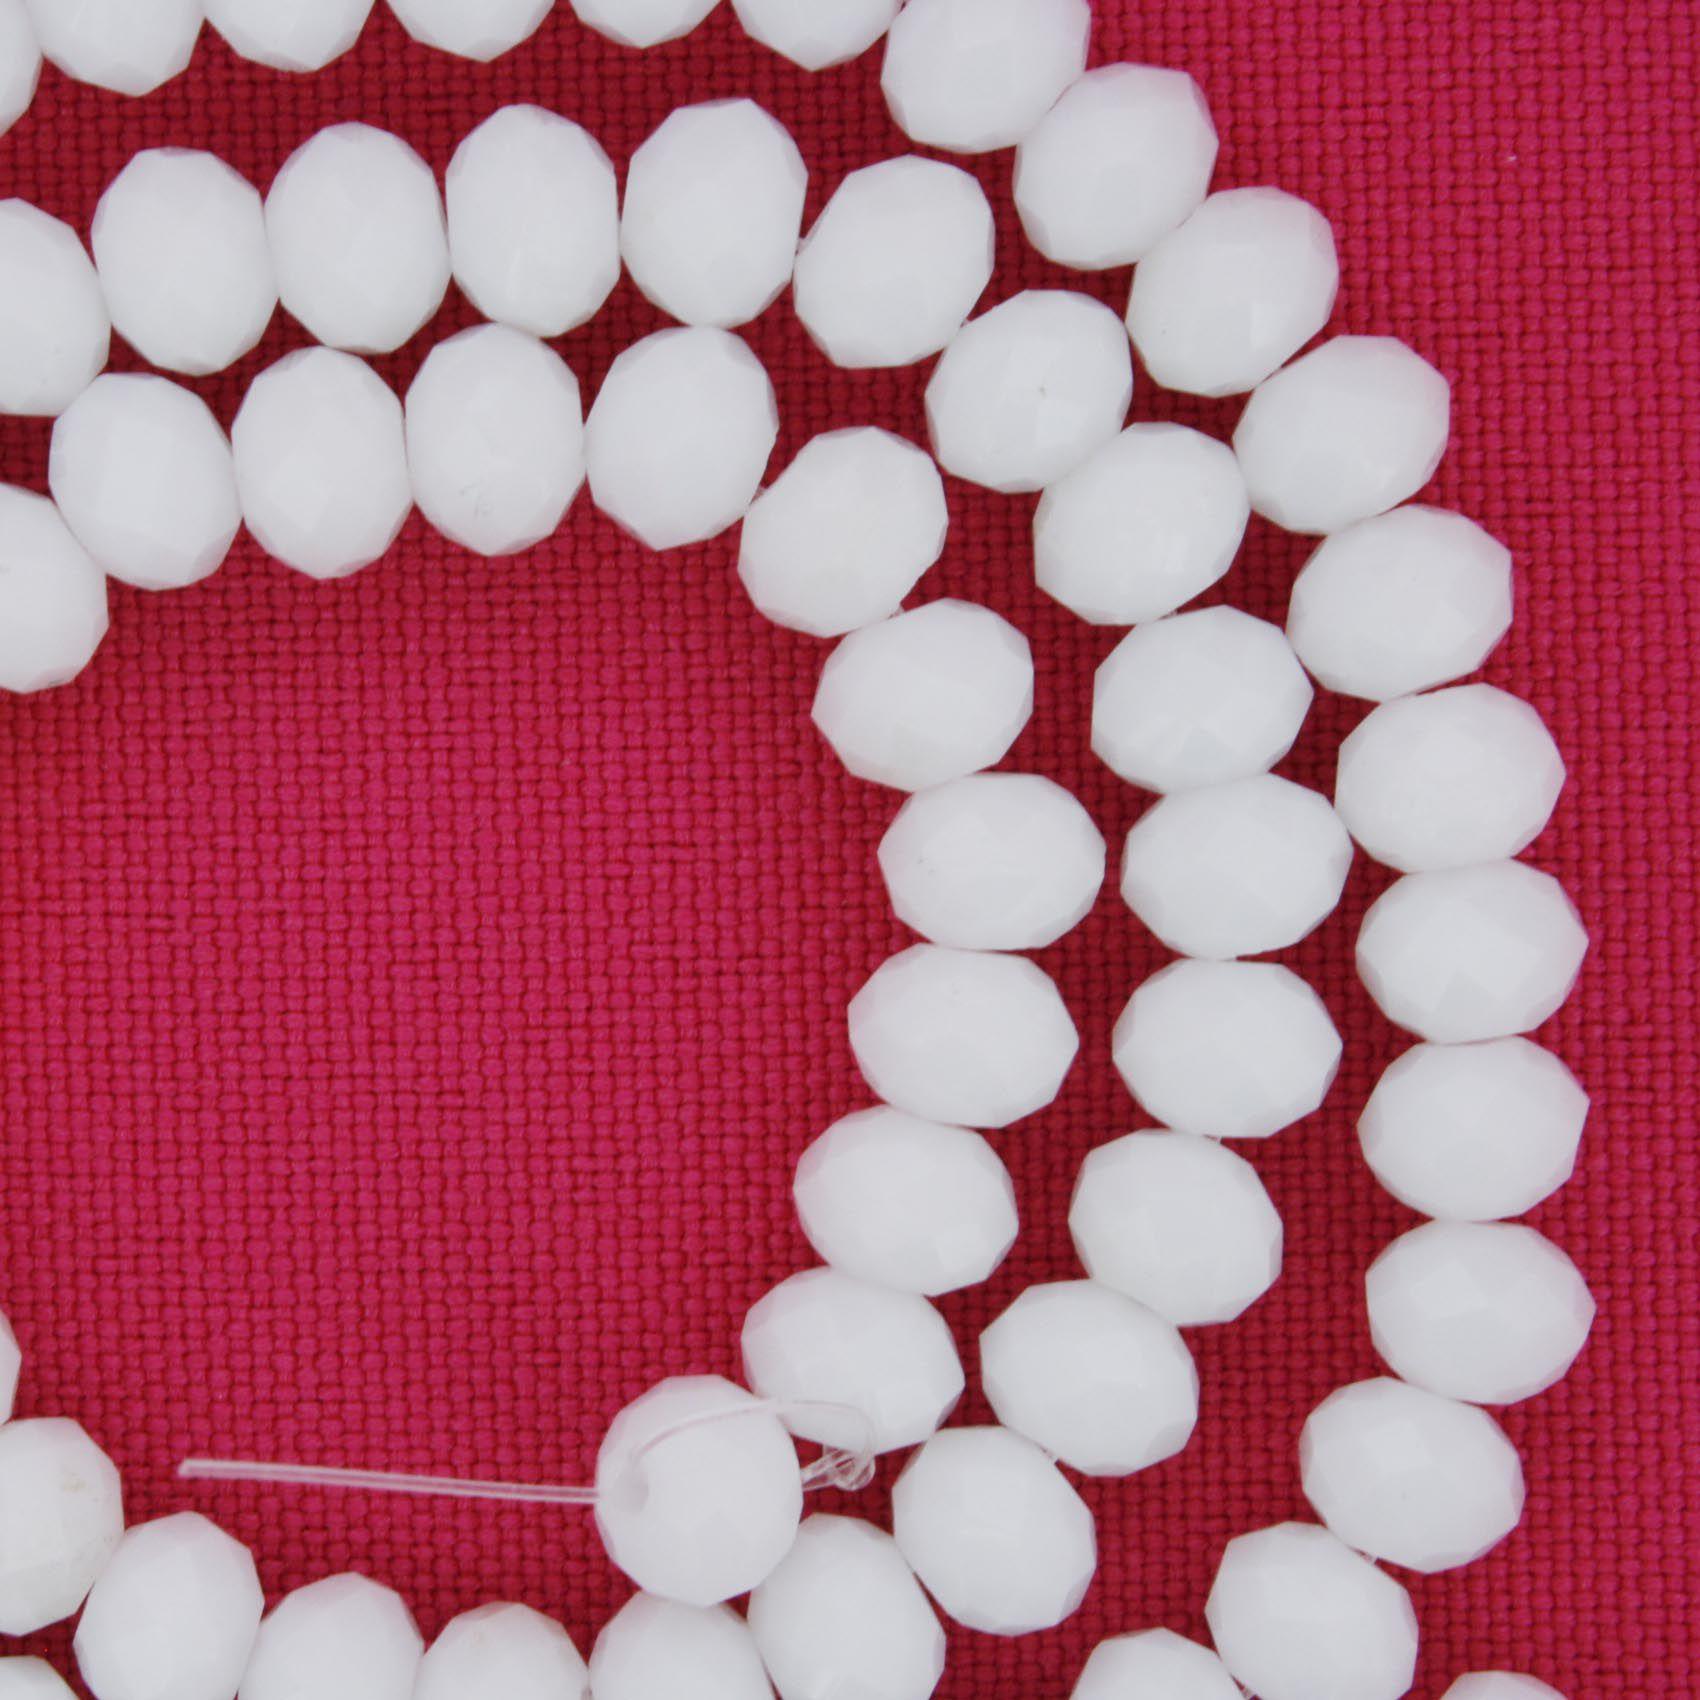 Fio de Cristal - Flat® - Branco - 6mm  - Stéphanie Bijoux® - Peças para Bijuterias e Artesanato